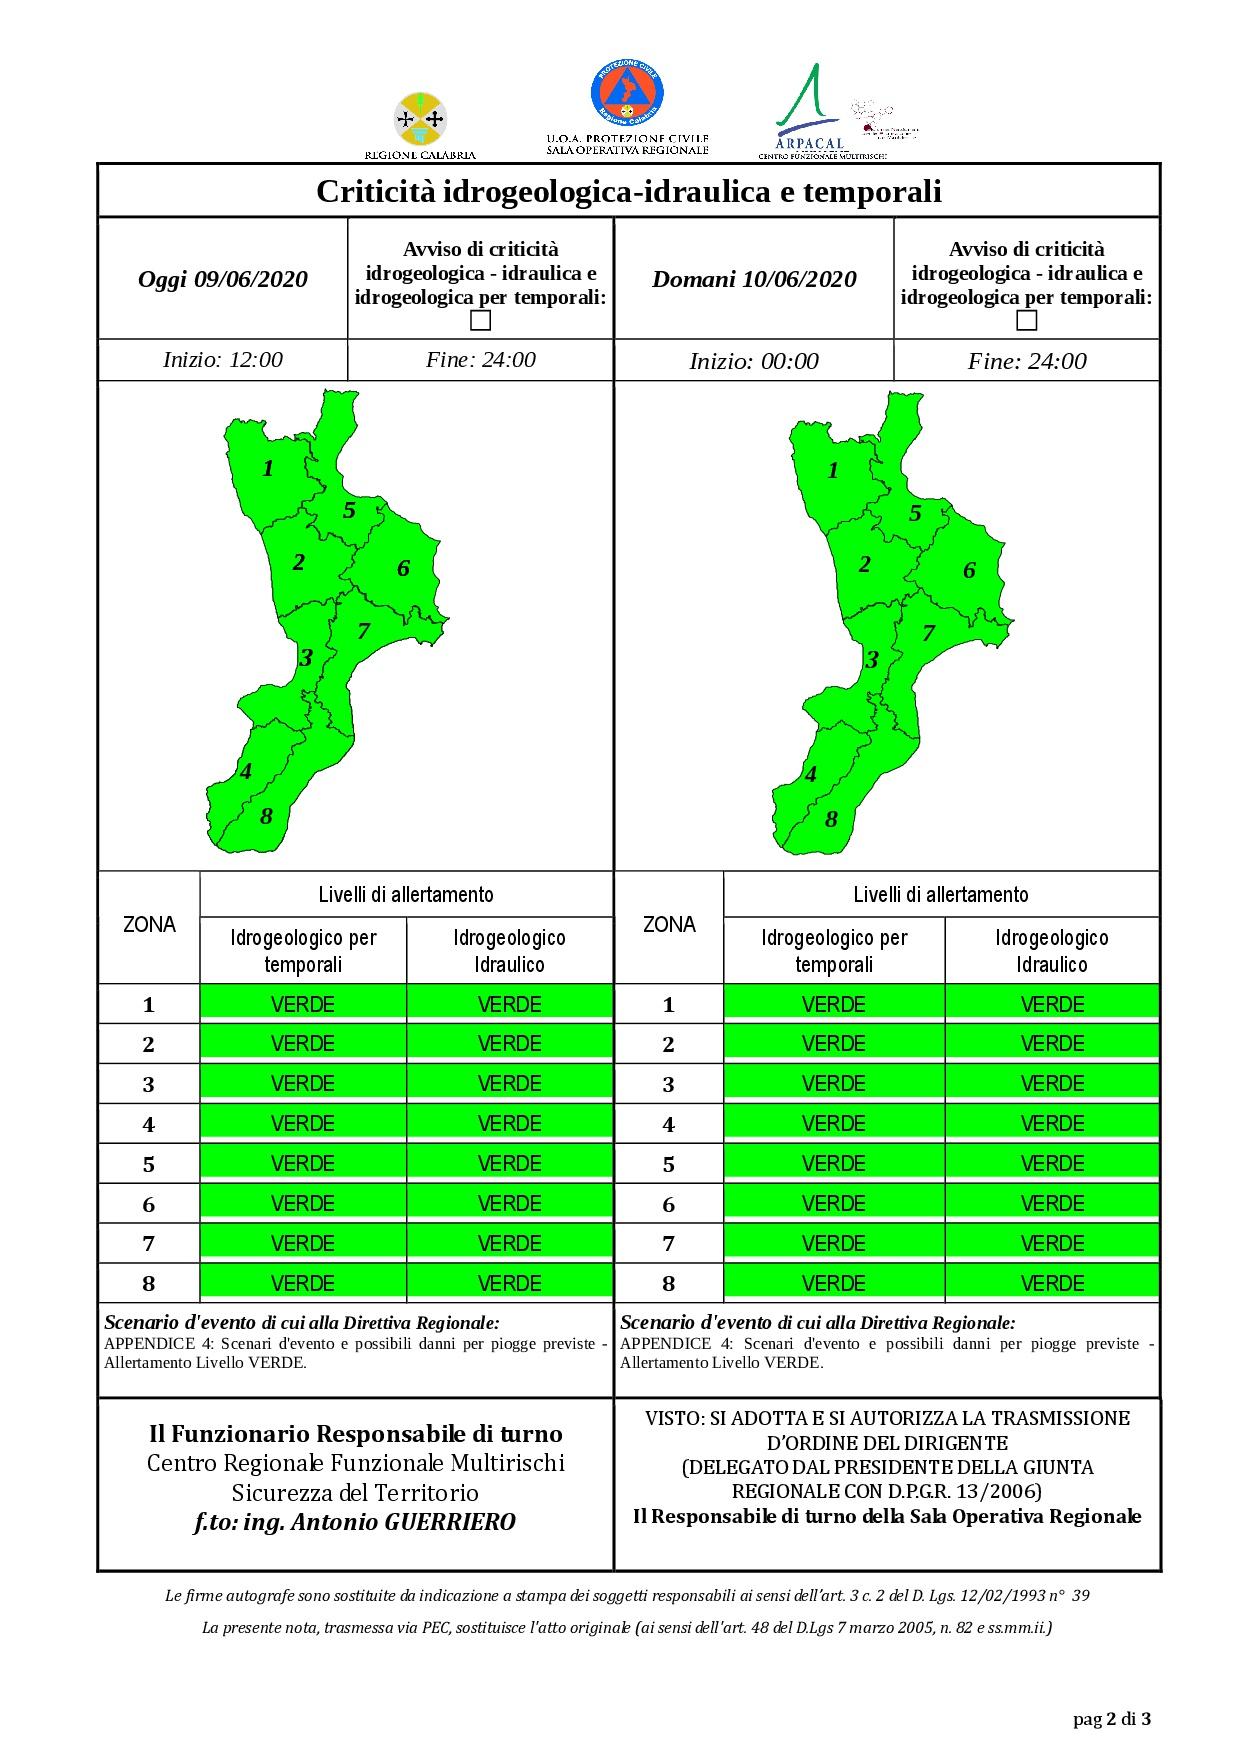 Criticità idrogeologica-idraulica e temporali in Calabria 09-06-2020